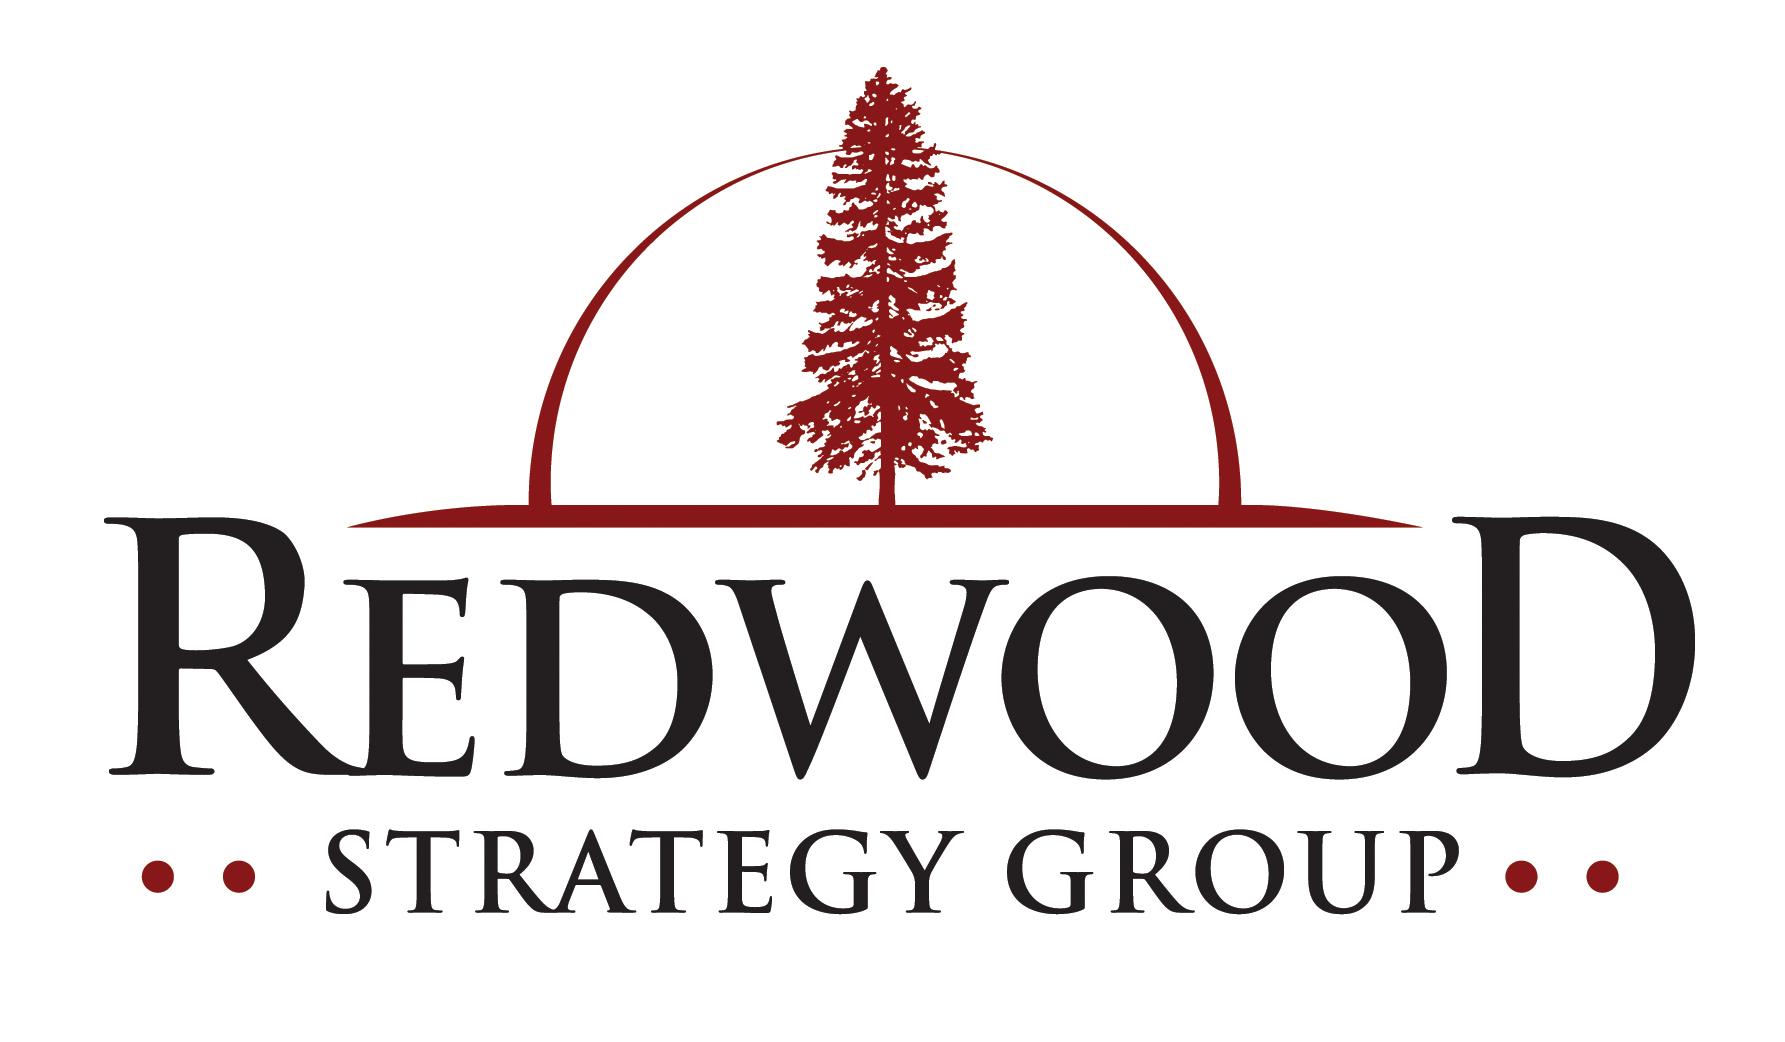 Redwood Strategy Group, Inc. logo